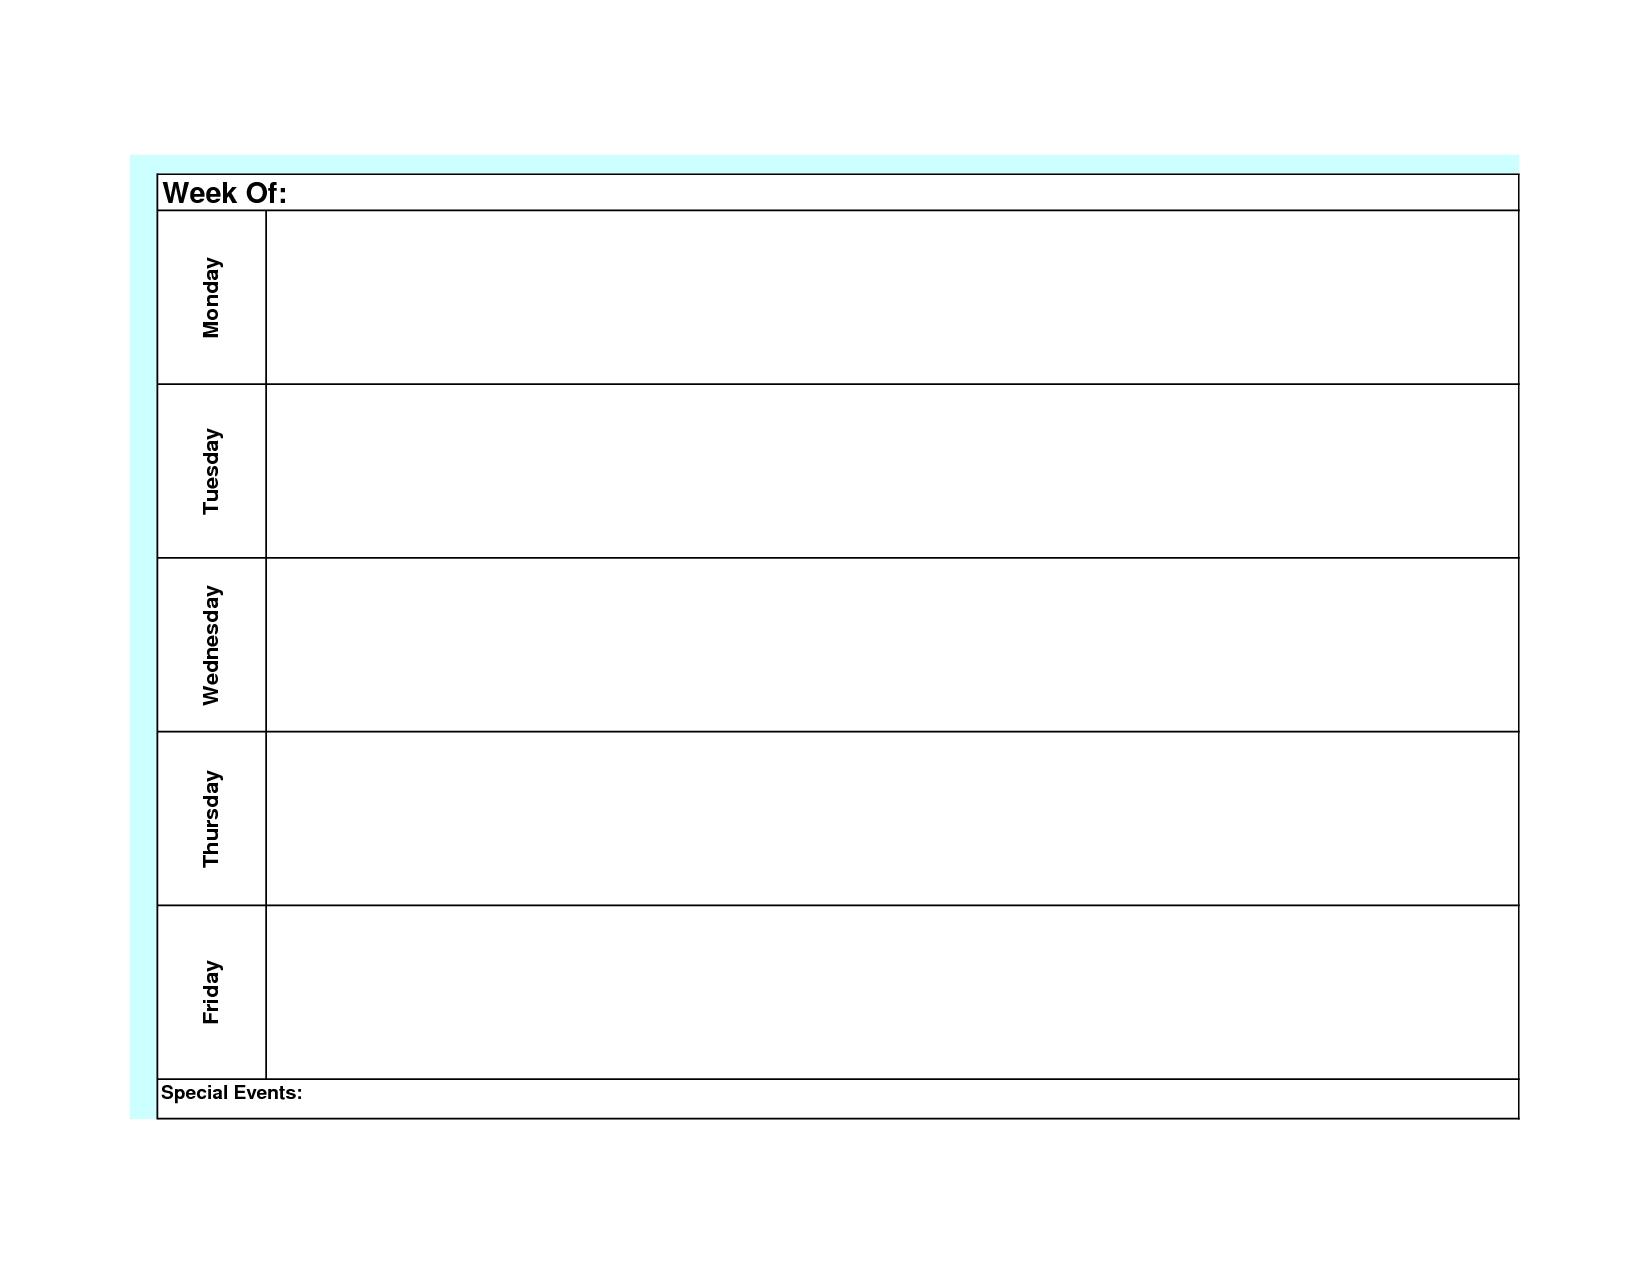 Blank Weekly Calendar Template Monday Friday | Planner-Monday To Friday Blank Calendar Printable